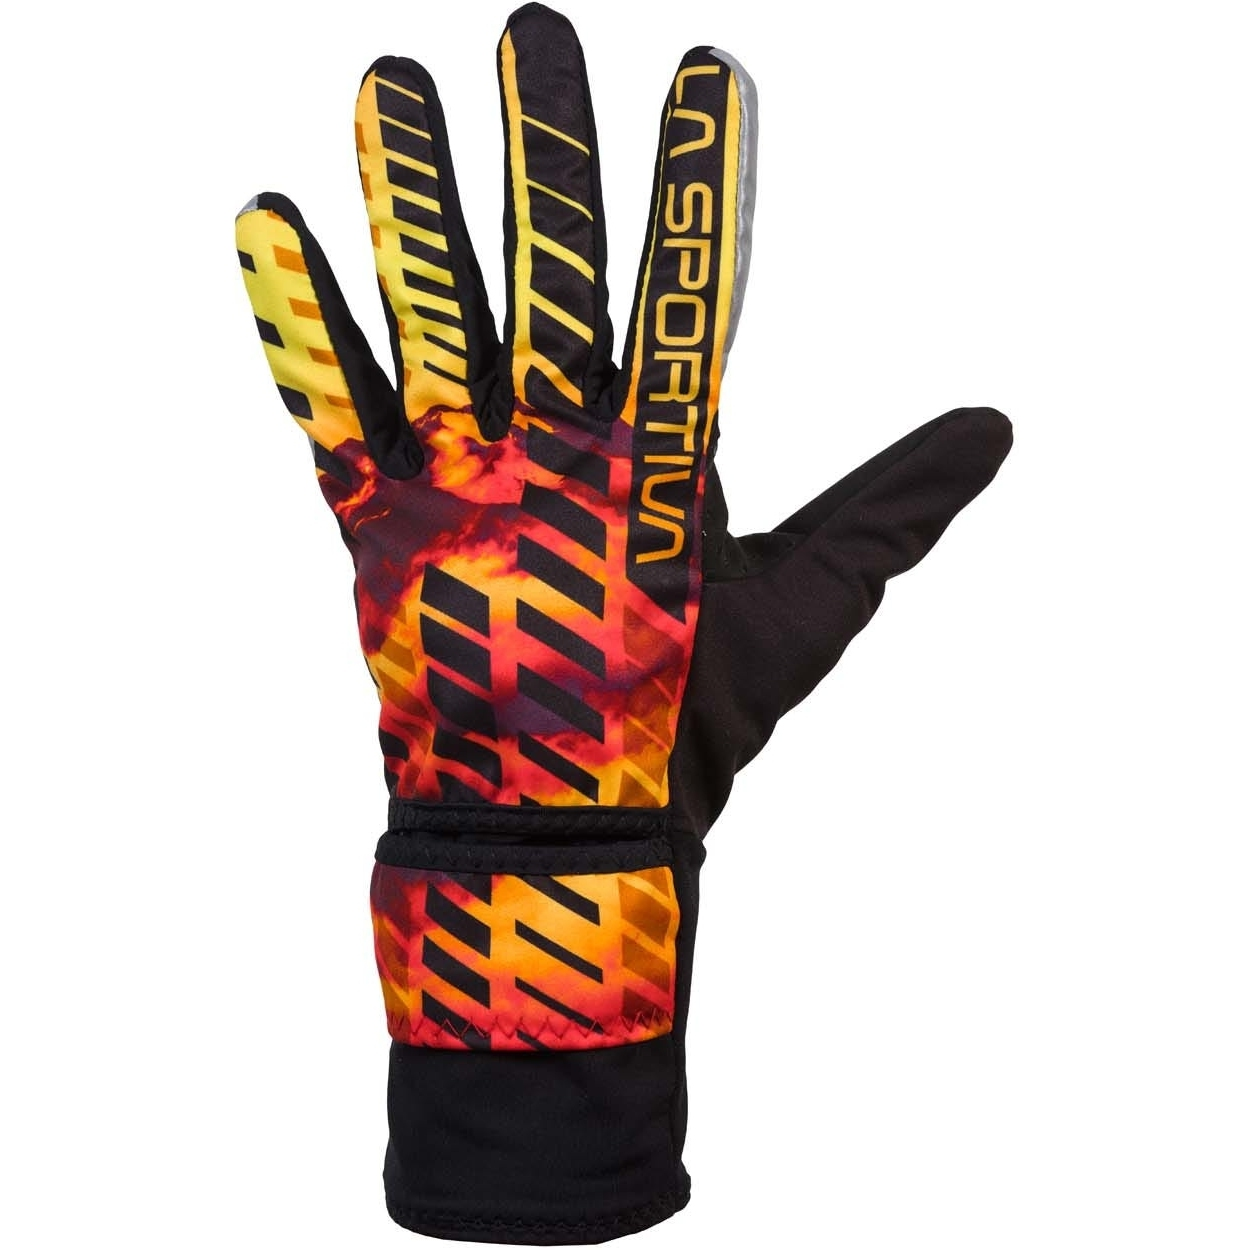 Image of La Sportiva Winter Running Gloves Evo - Black/Yellow